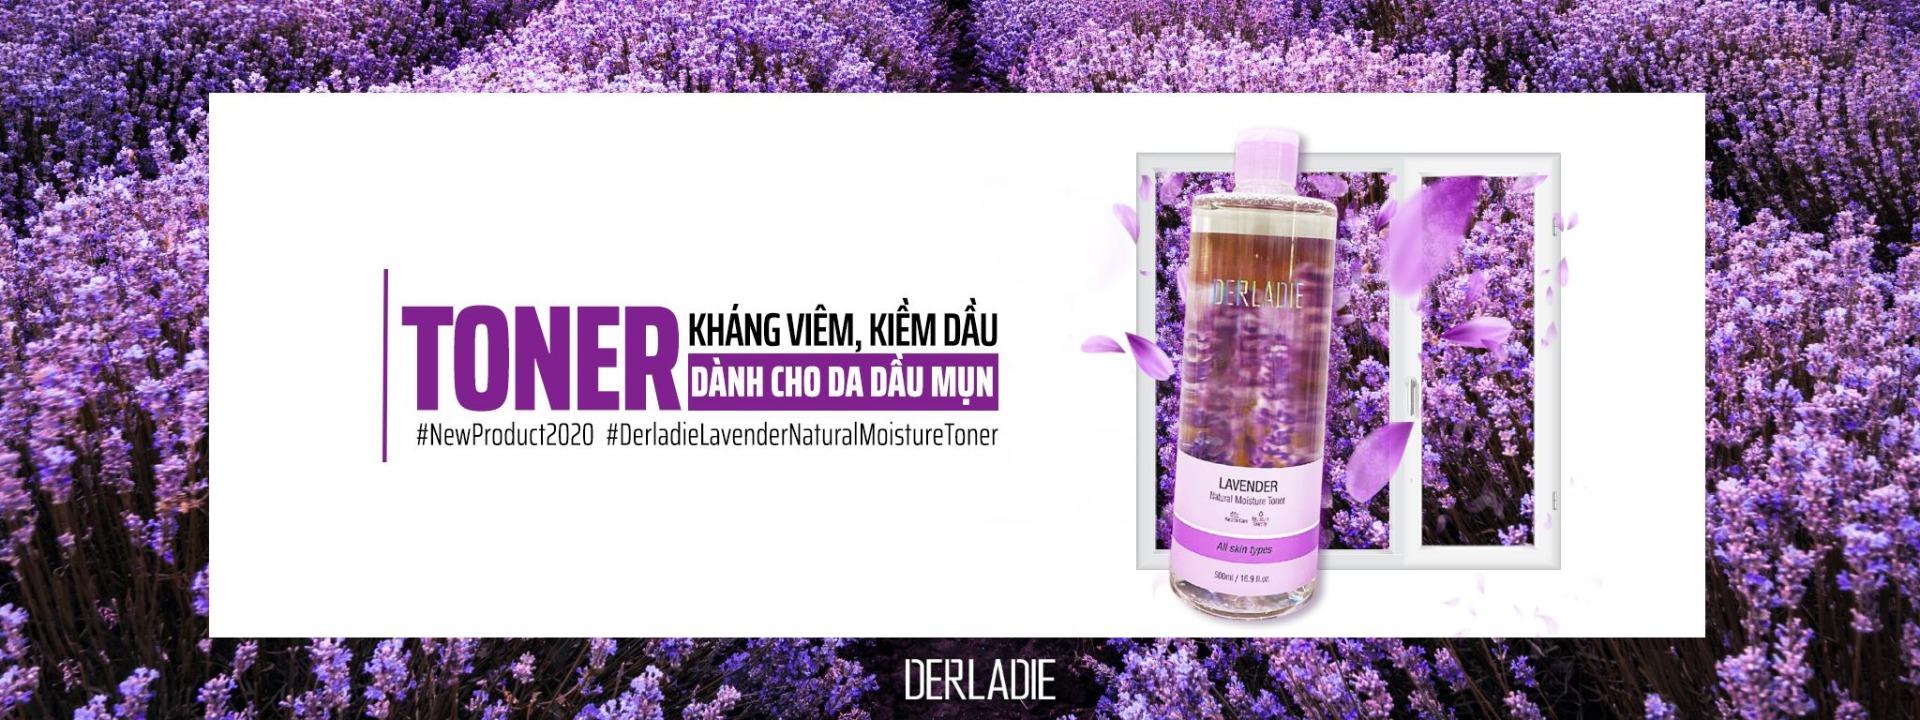 Nước Hoa Hồng Dành Cho Da Mụn Chiết Xuất Lavender Derladie Lavender Natural Moisture Toner 500ml